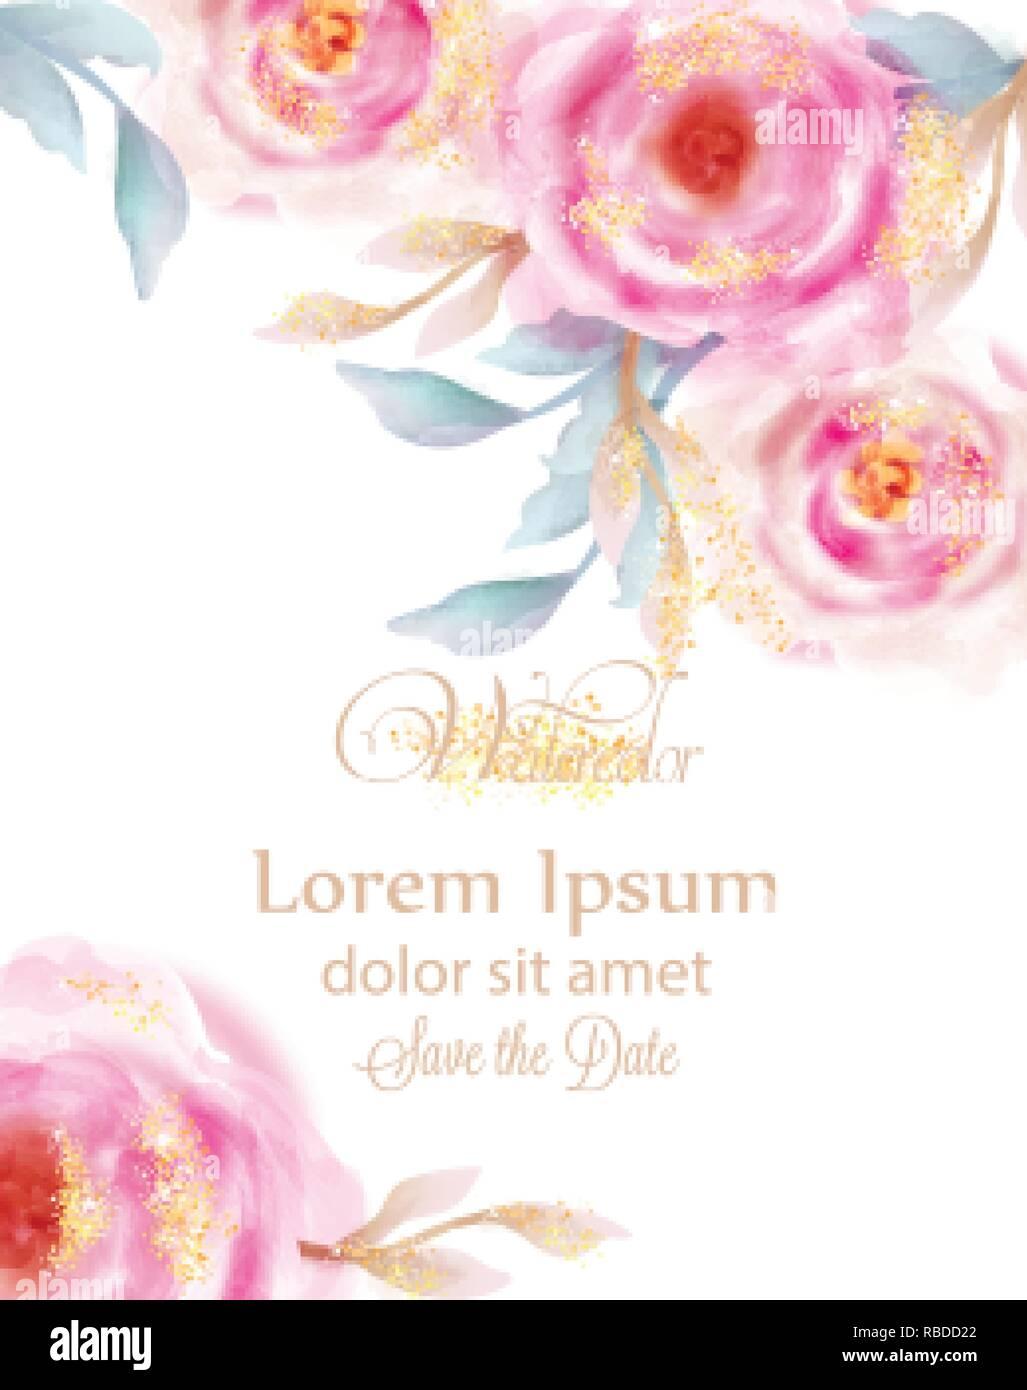 Acuarela Rosas Rosas Con Lentejuelas De Oro Vector Tarjeta